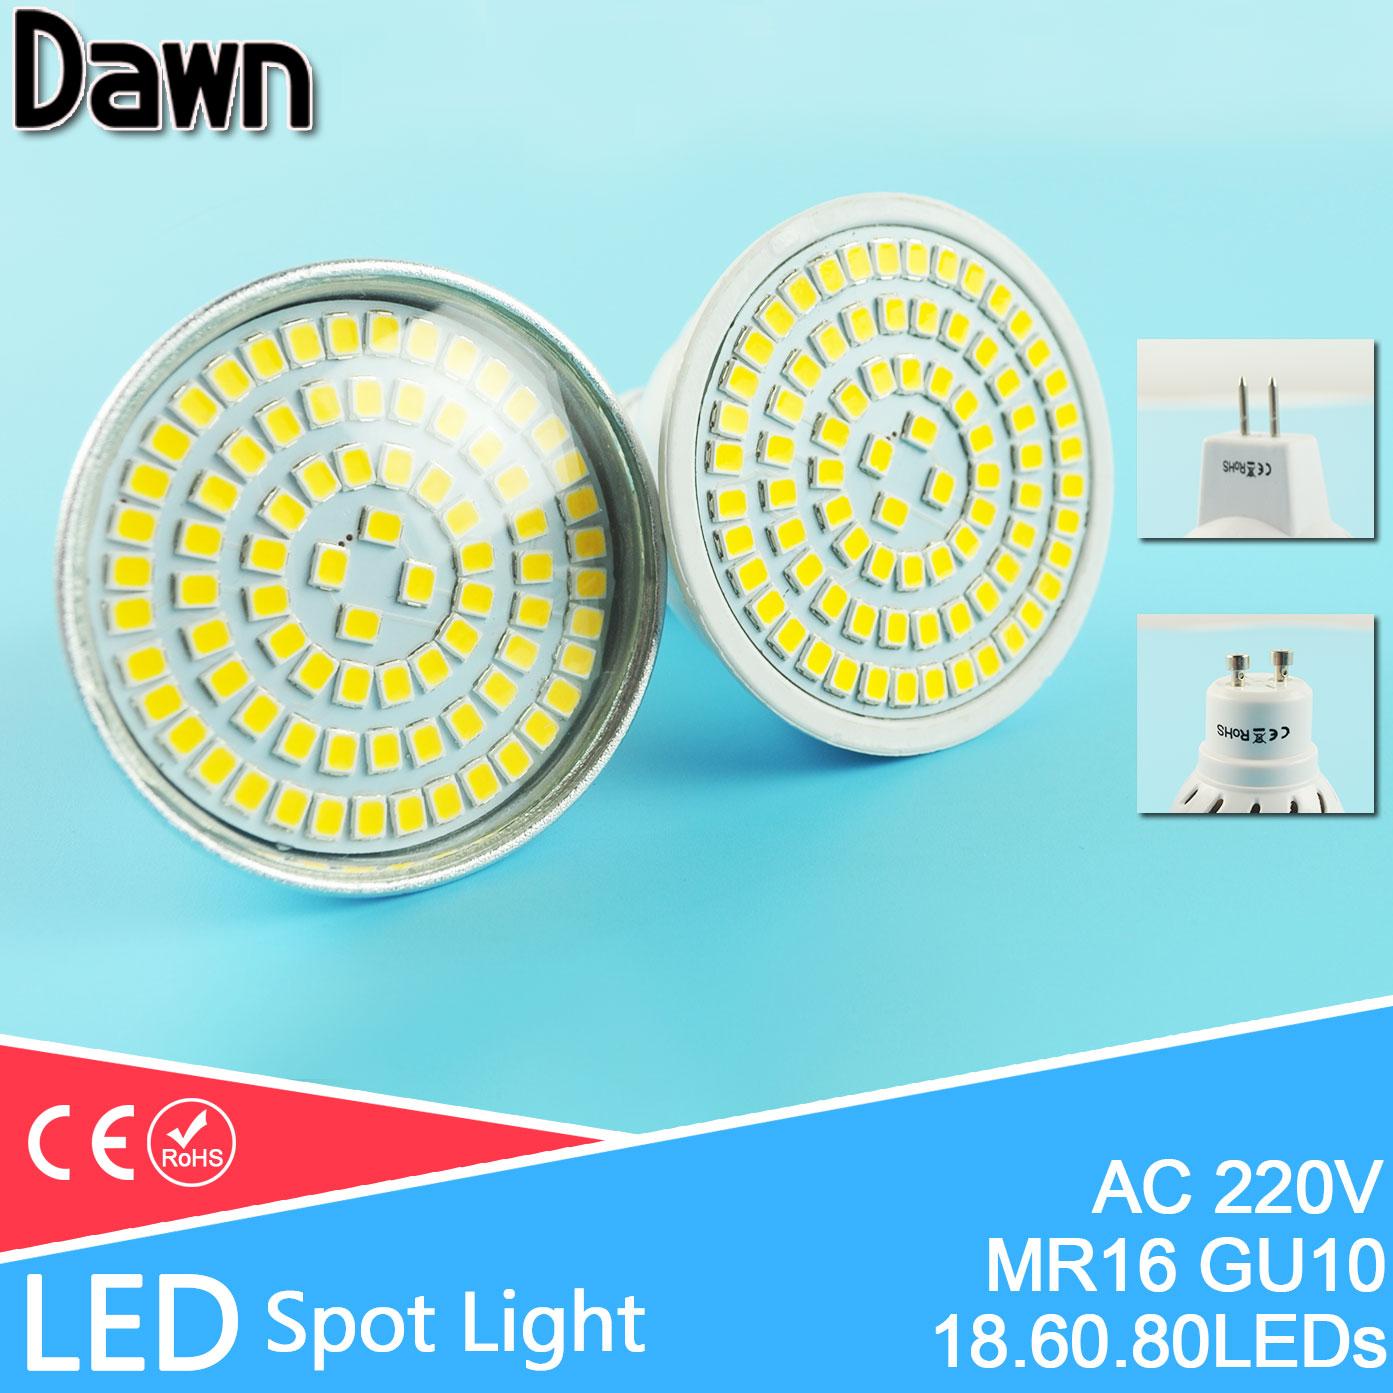 LED Spotlight Bulb Bombilla LED GU5.3/MR16 GU10 AC 220V 4W 6W 8W 9W SMD 5730/2835 Spot Light Bulb Lampada Ampoule Lamp Lampara